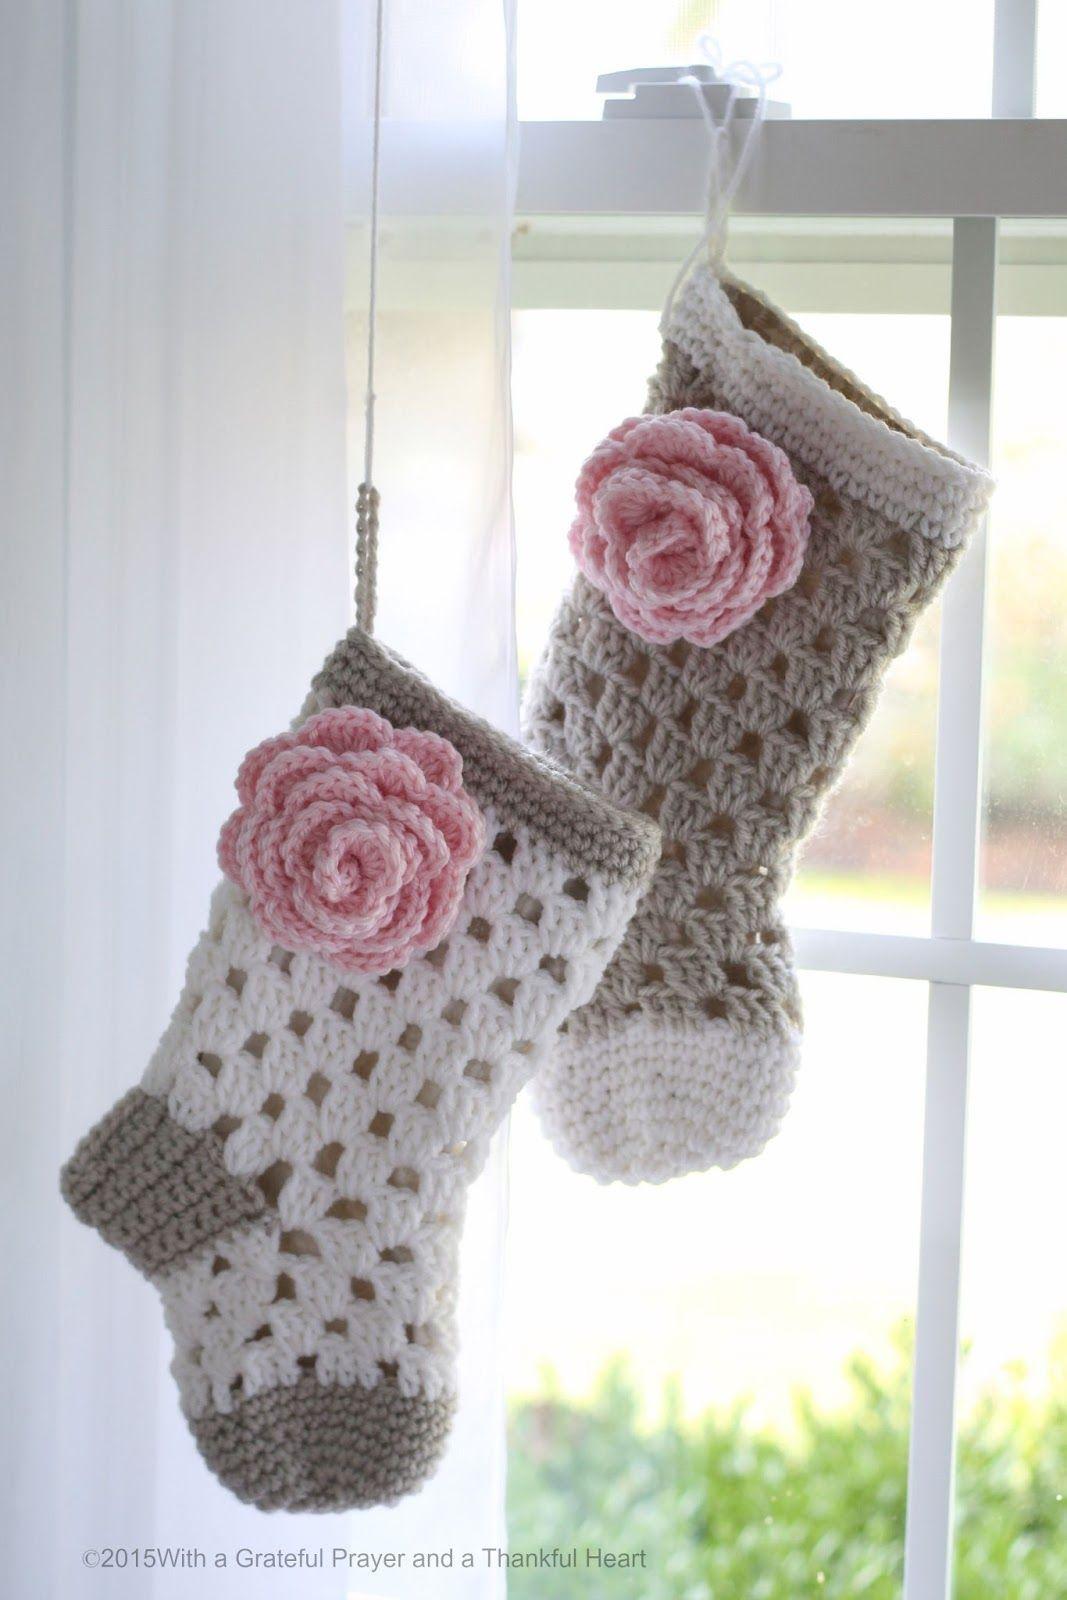 Babies 1st christmas crochet stocking pattern for shower gift babies 1st christmas crochet stocking pattern for shower gift bankloansurffo Choice Image